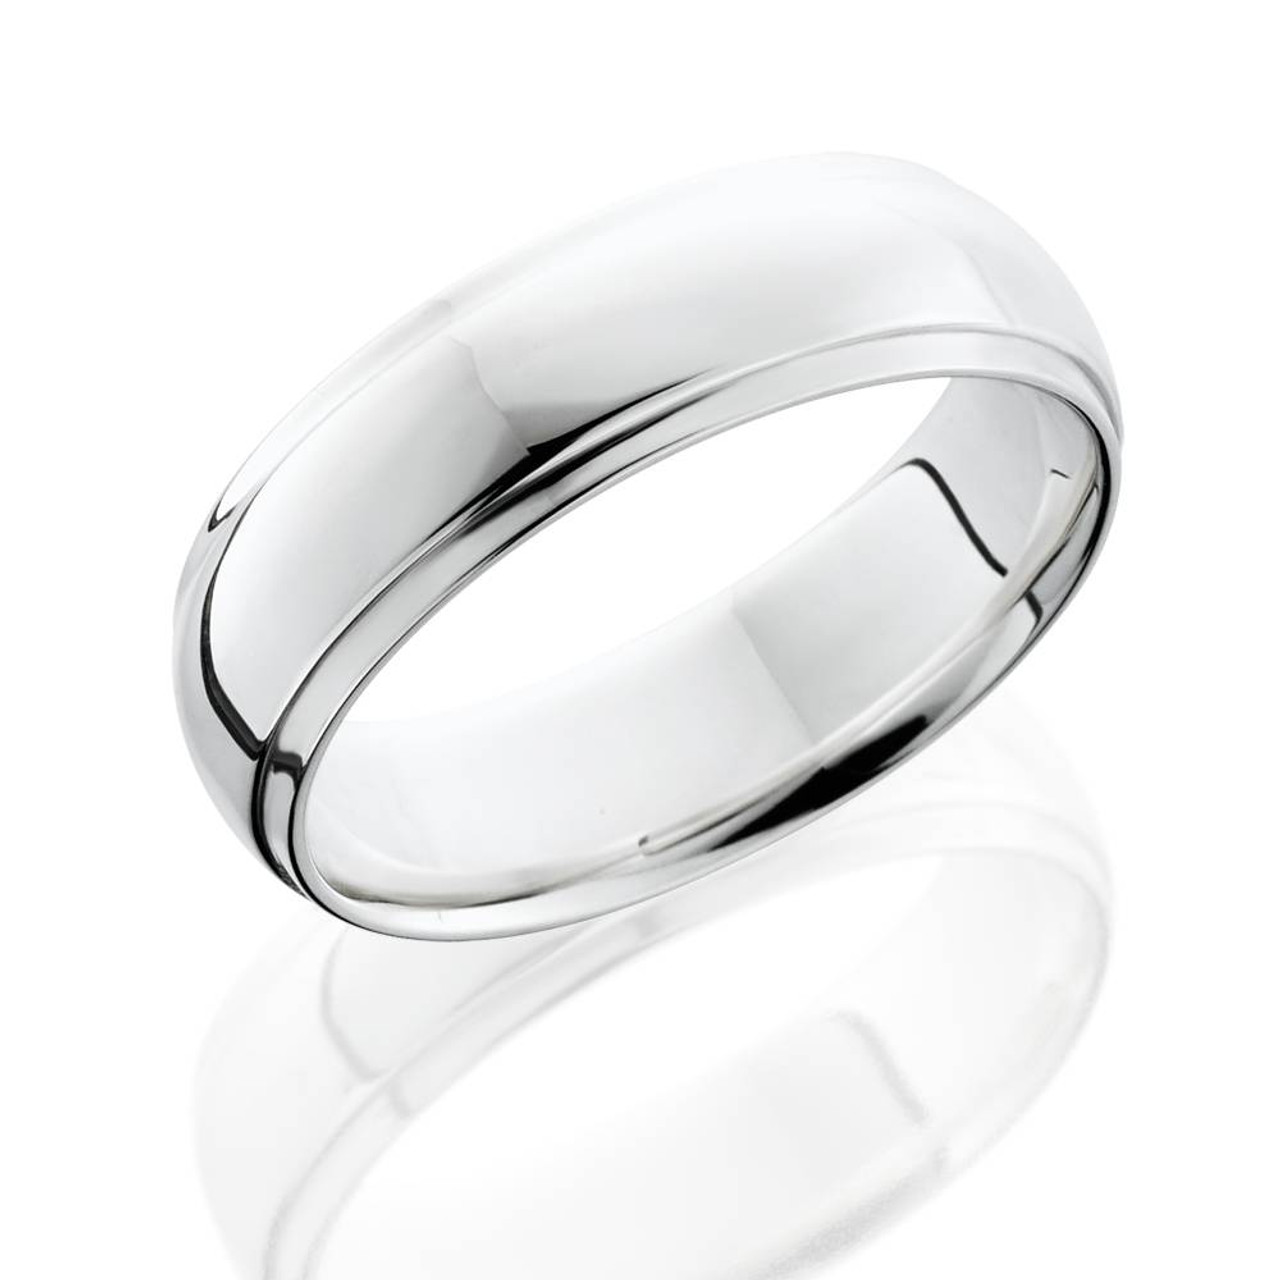 Mens 10K White Gold 5mm Edged Half Round Wedding Band Ring